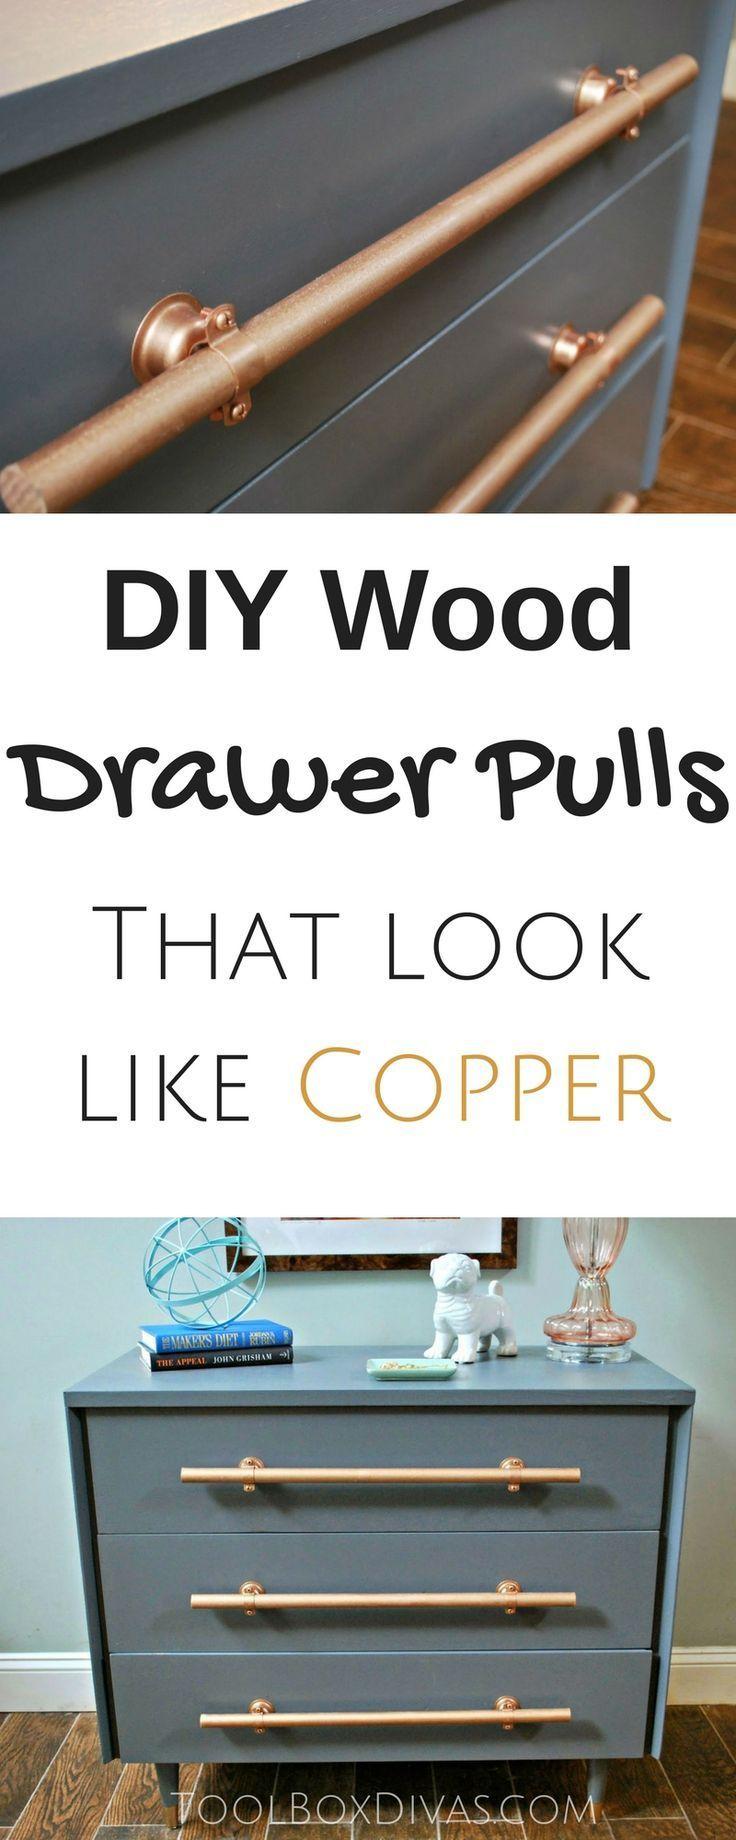 Best inexpensive drawer pulls furniture makeover dresser and hardware